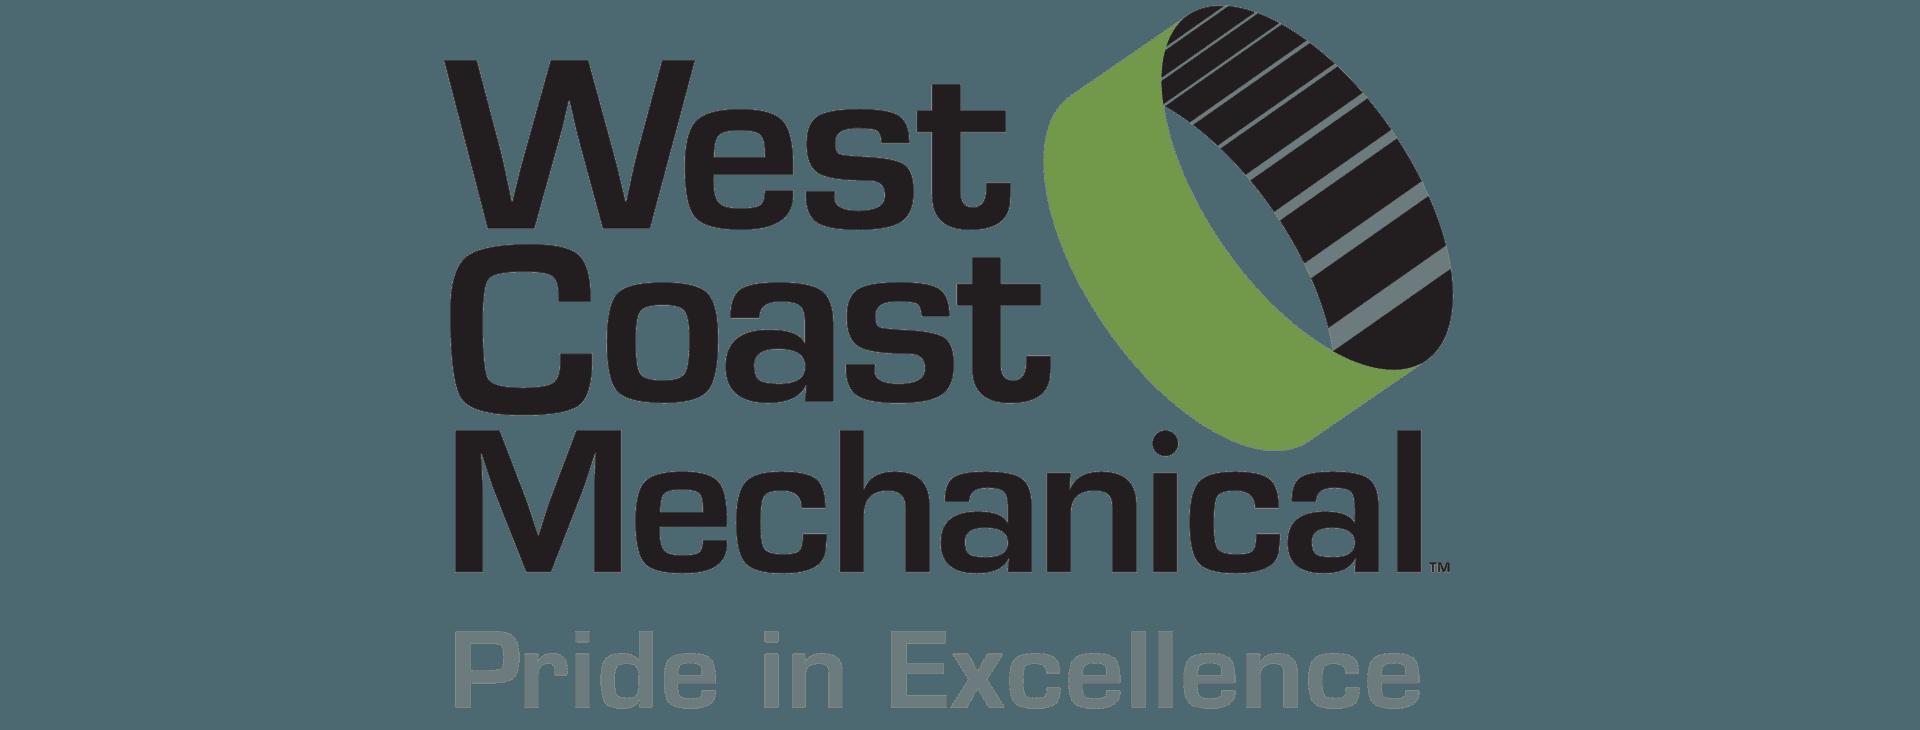 West Coast Mechanical Group Logo